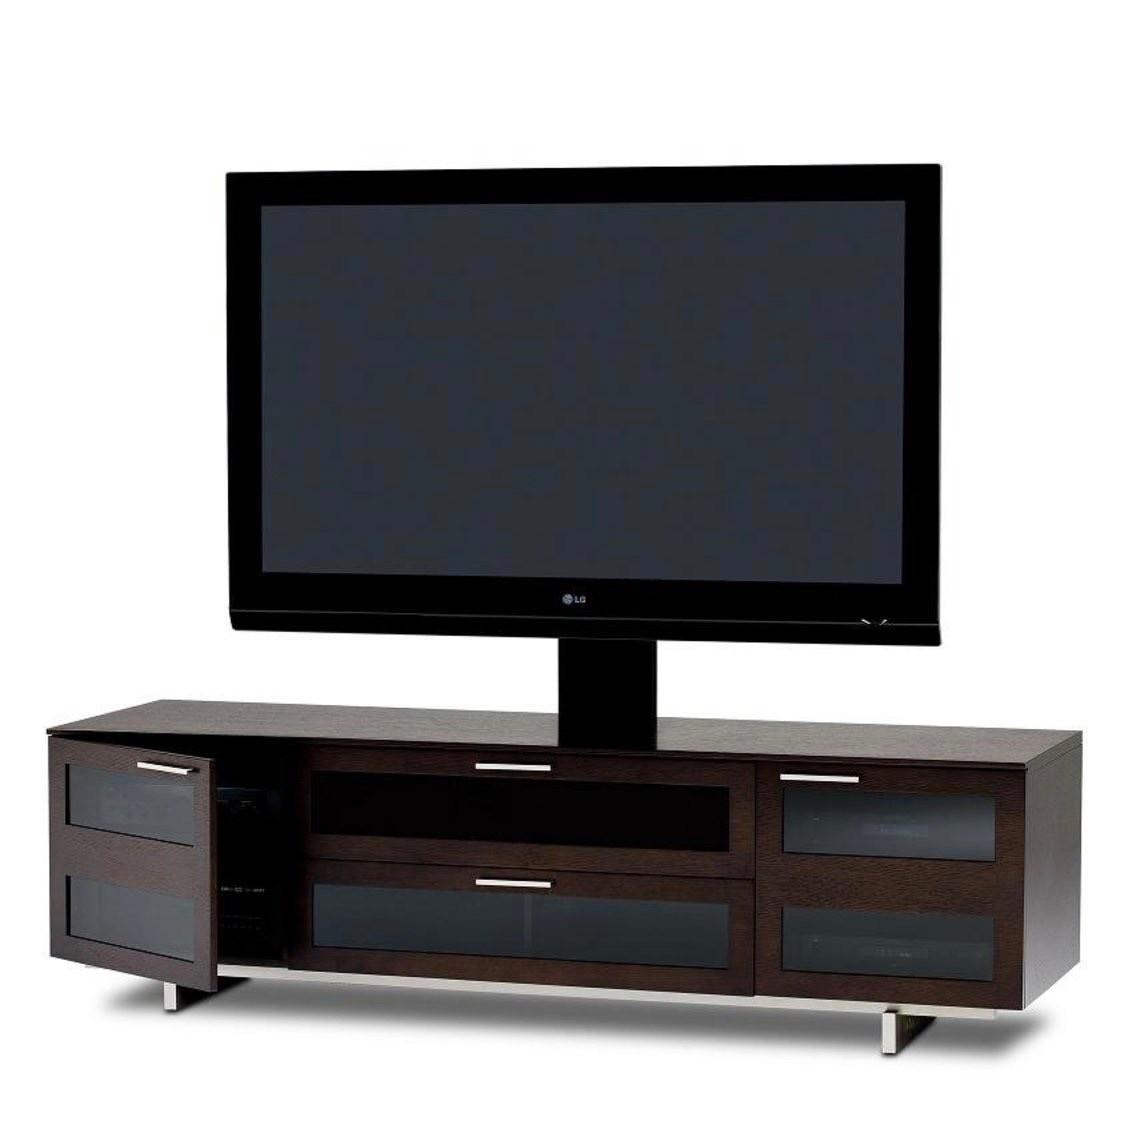 BDI Avion 8929 Four-Component Wide TV Cabinet